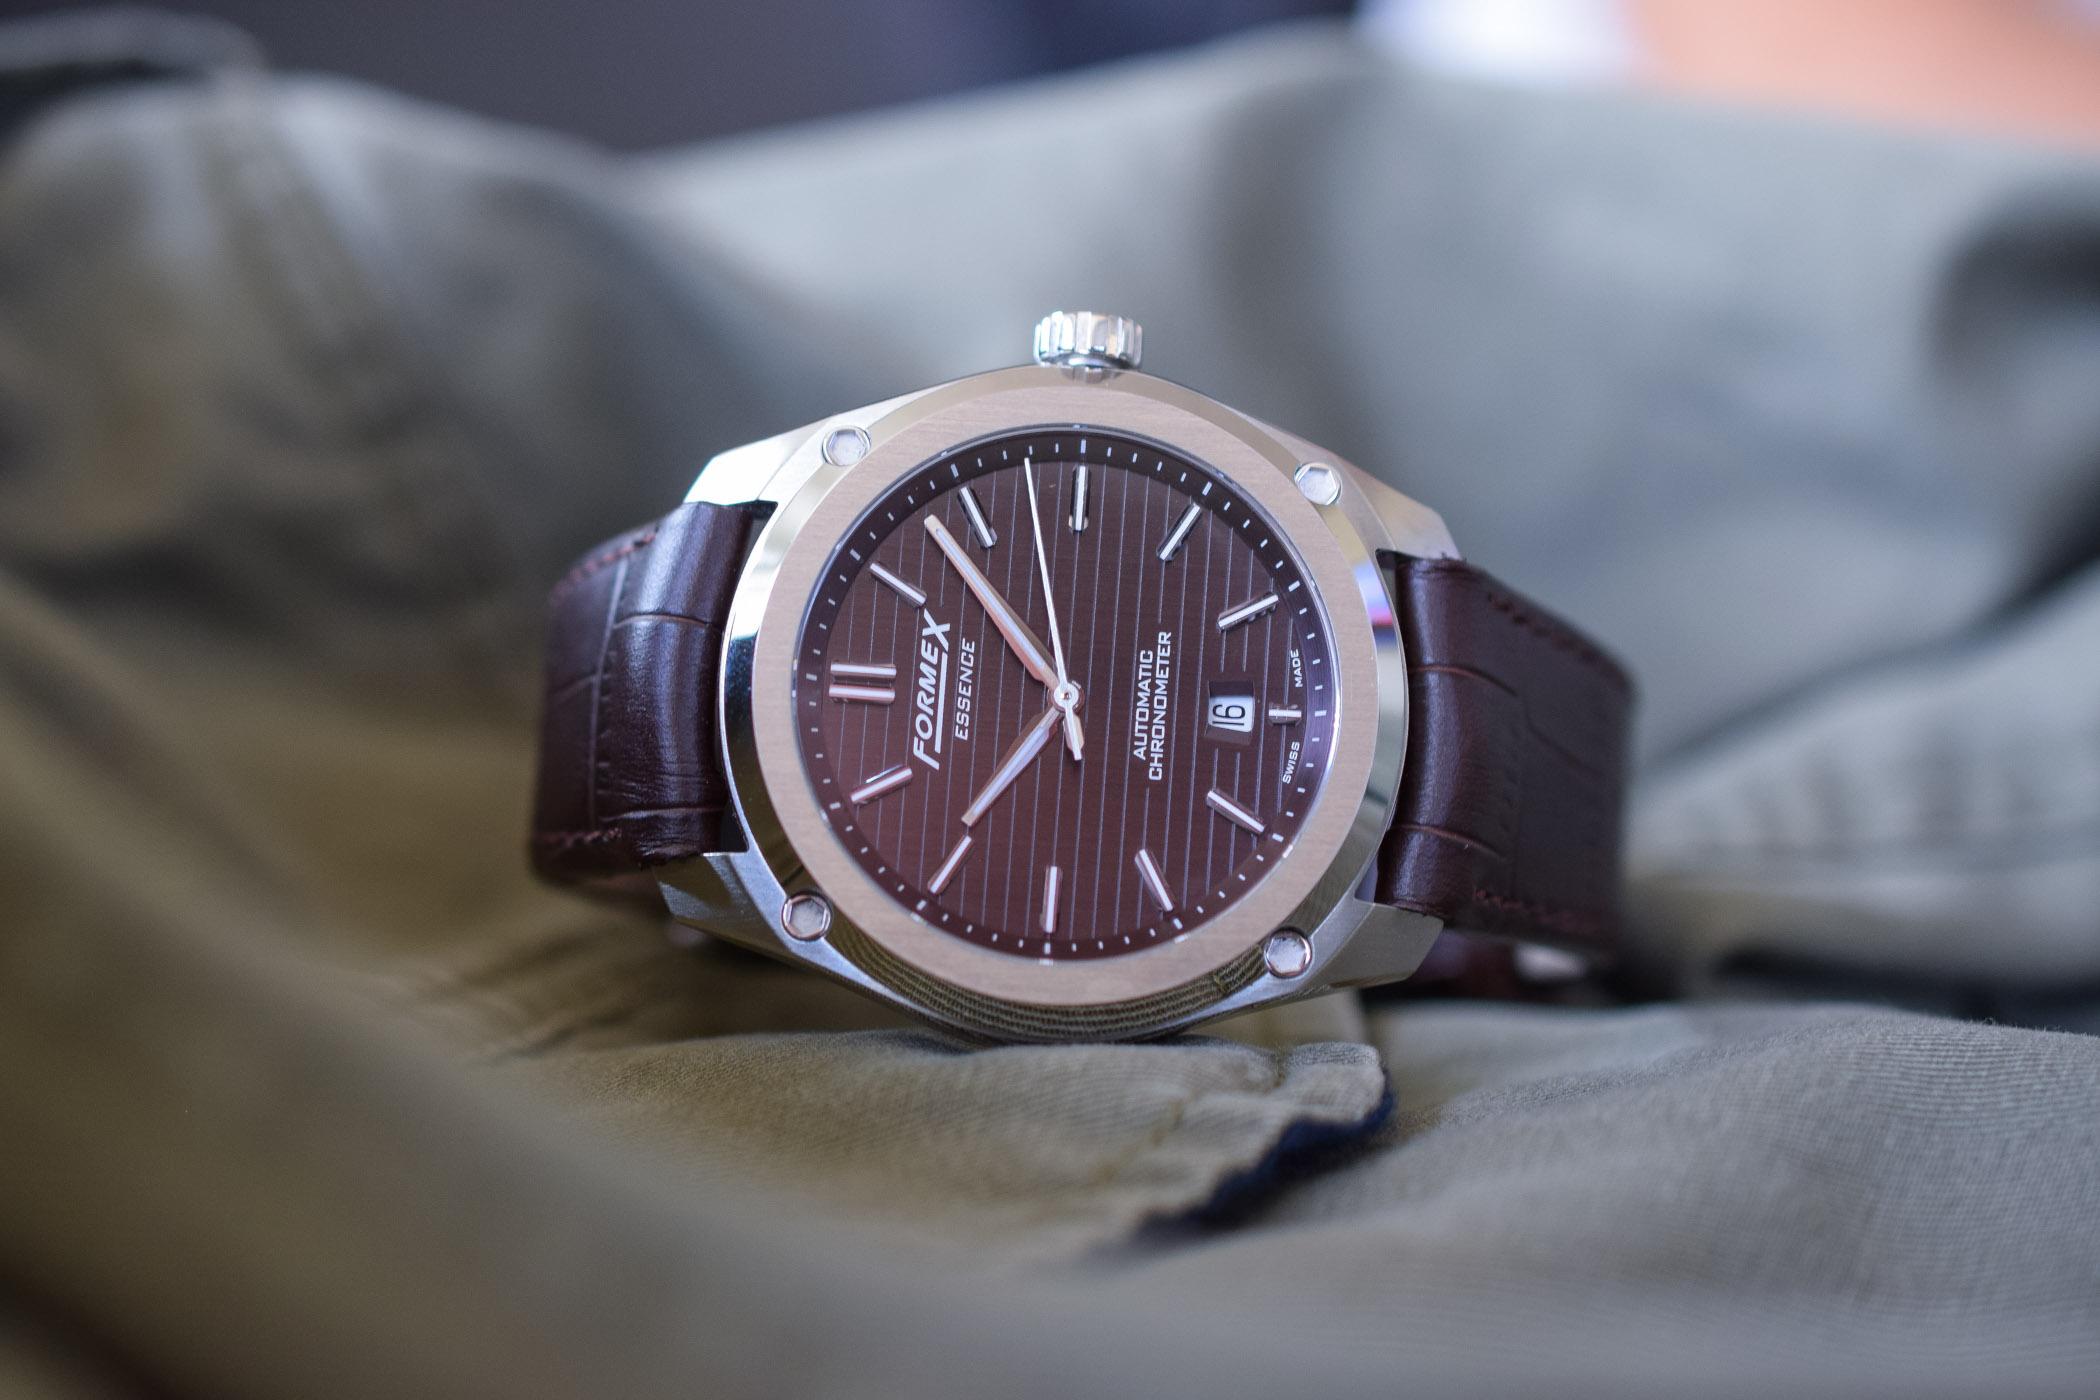 Formex Essence Automatic Chronometer